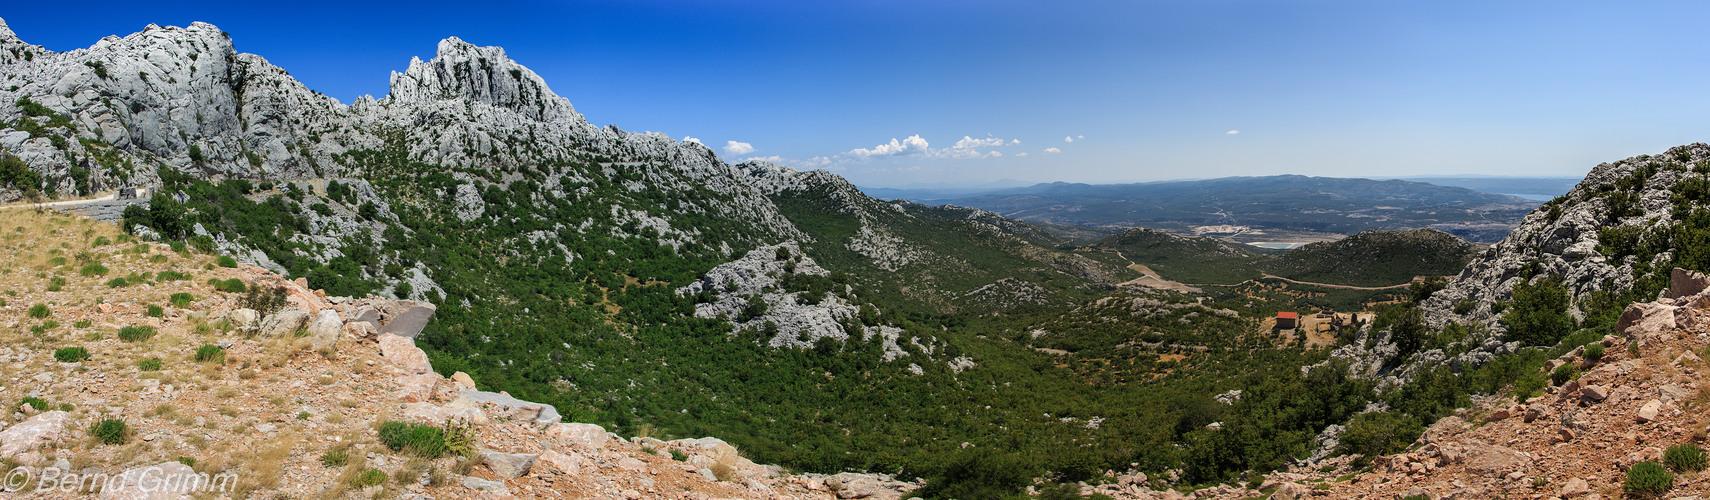 Kroatien: Velebitgebirge